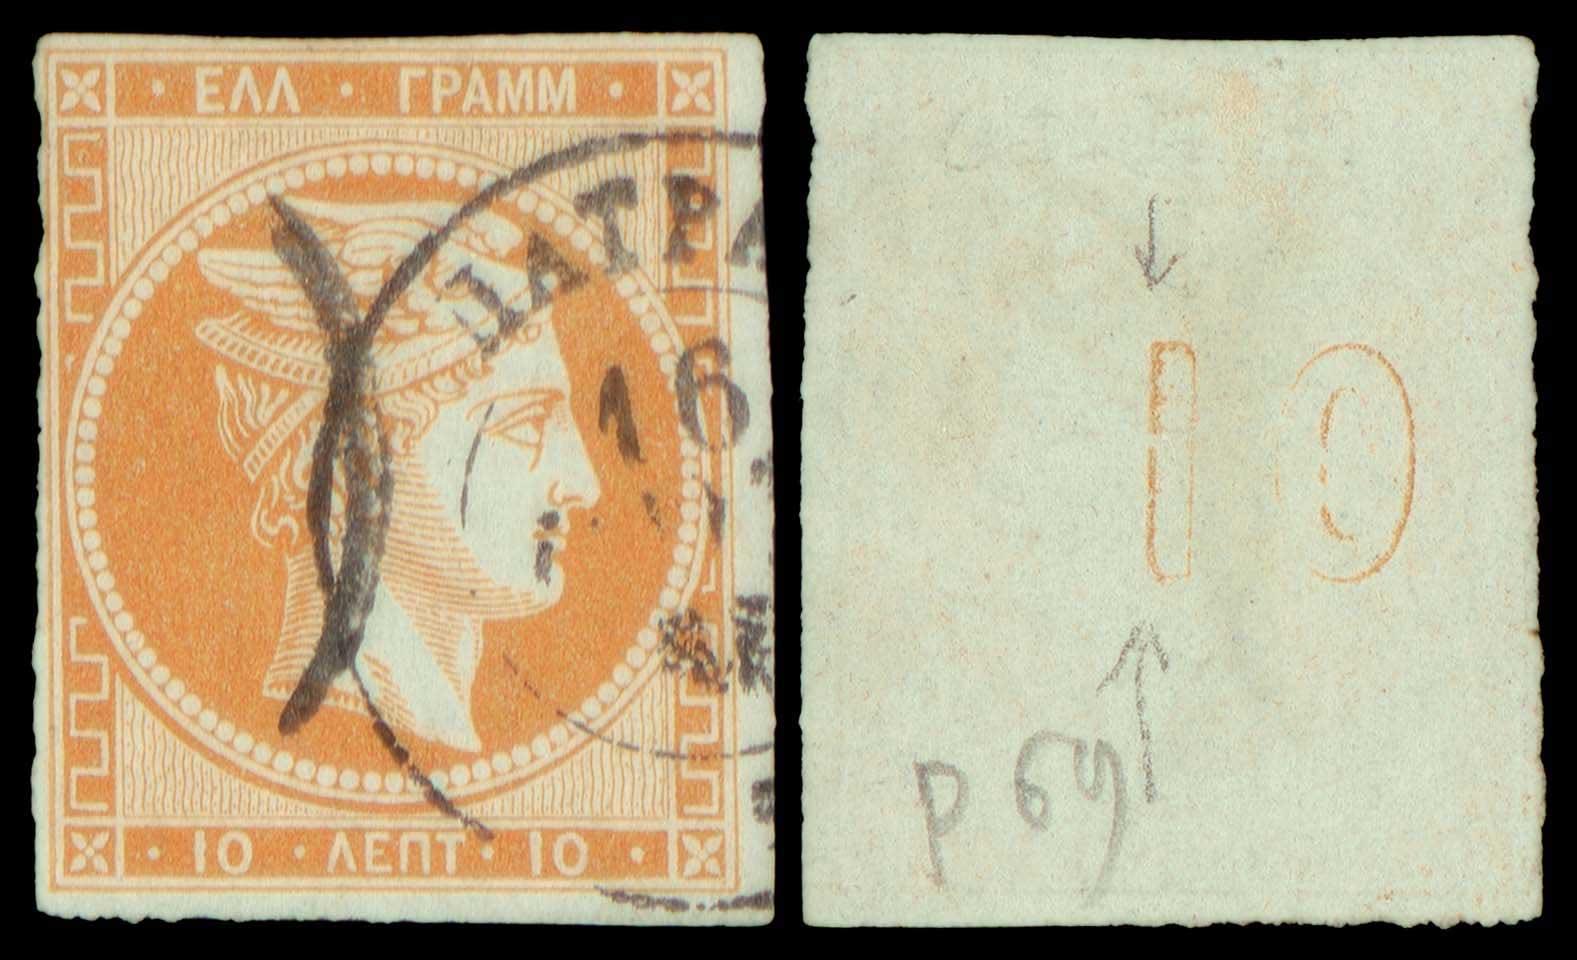 Lot 63 - -  LARGE HERMES HEAD 1862/67 consecutive athens printings -  A. Karamitsos Public Auction № 670 General Sale